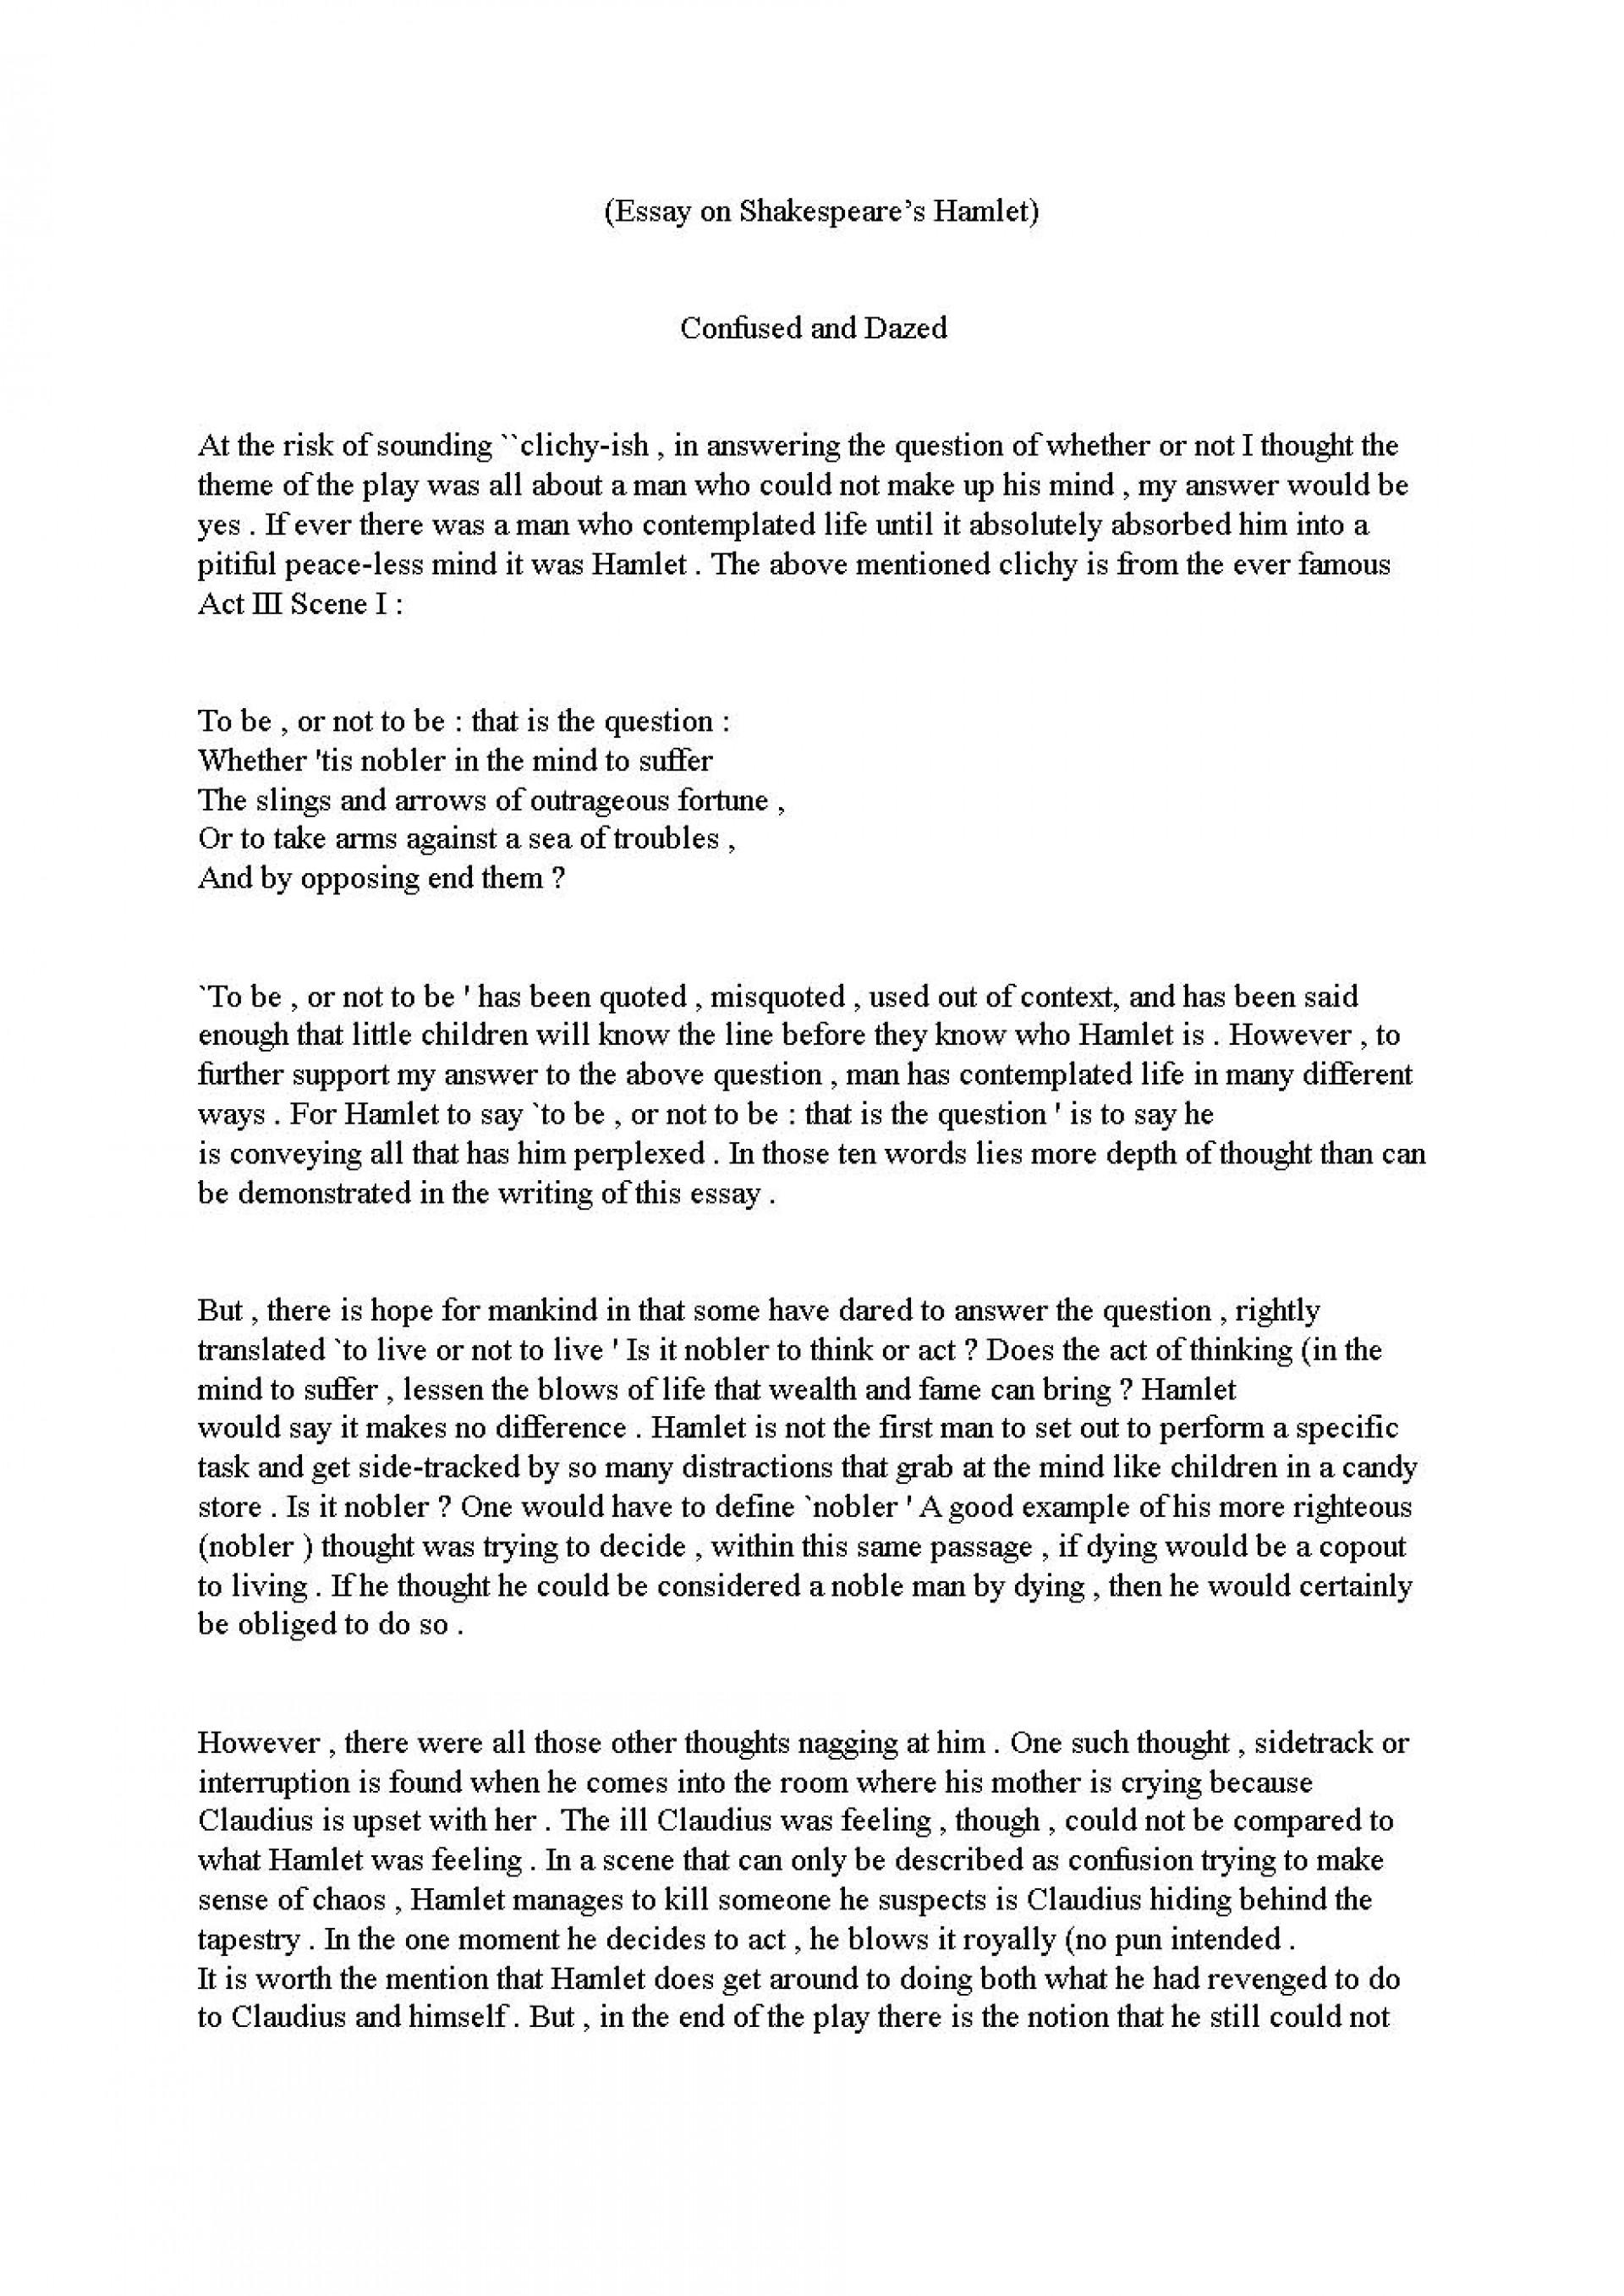 Essay on Public Speech - Words | Bartleby